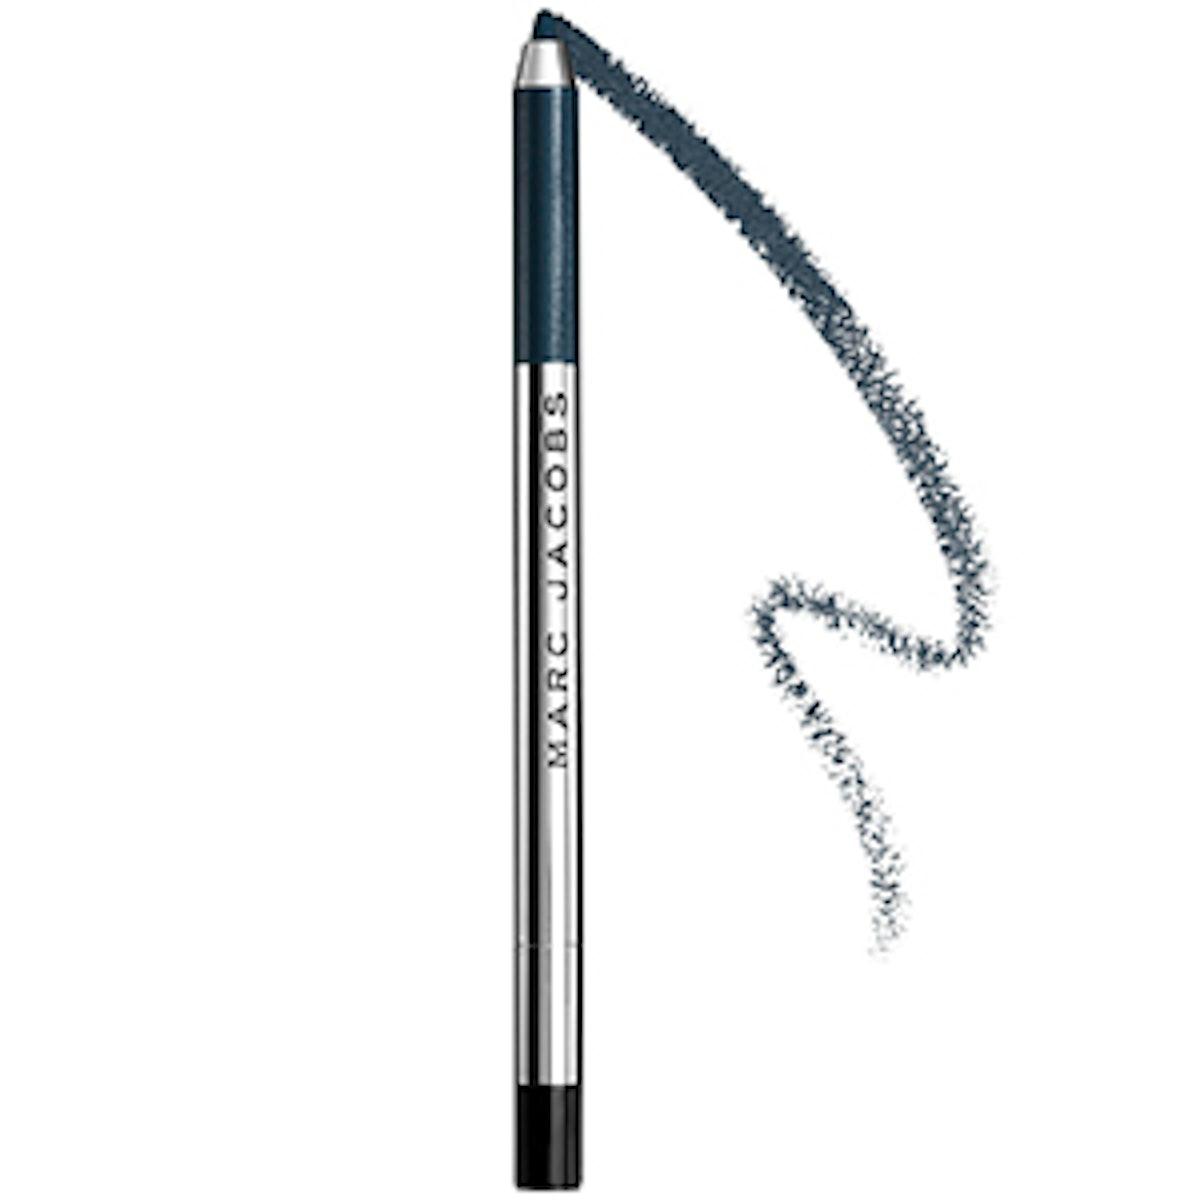 Marc Jacobs Beauty Highliner Gel Eye Crayon Liner in Deep Navy